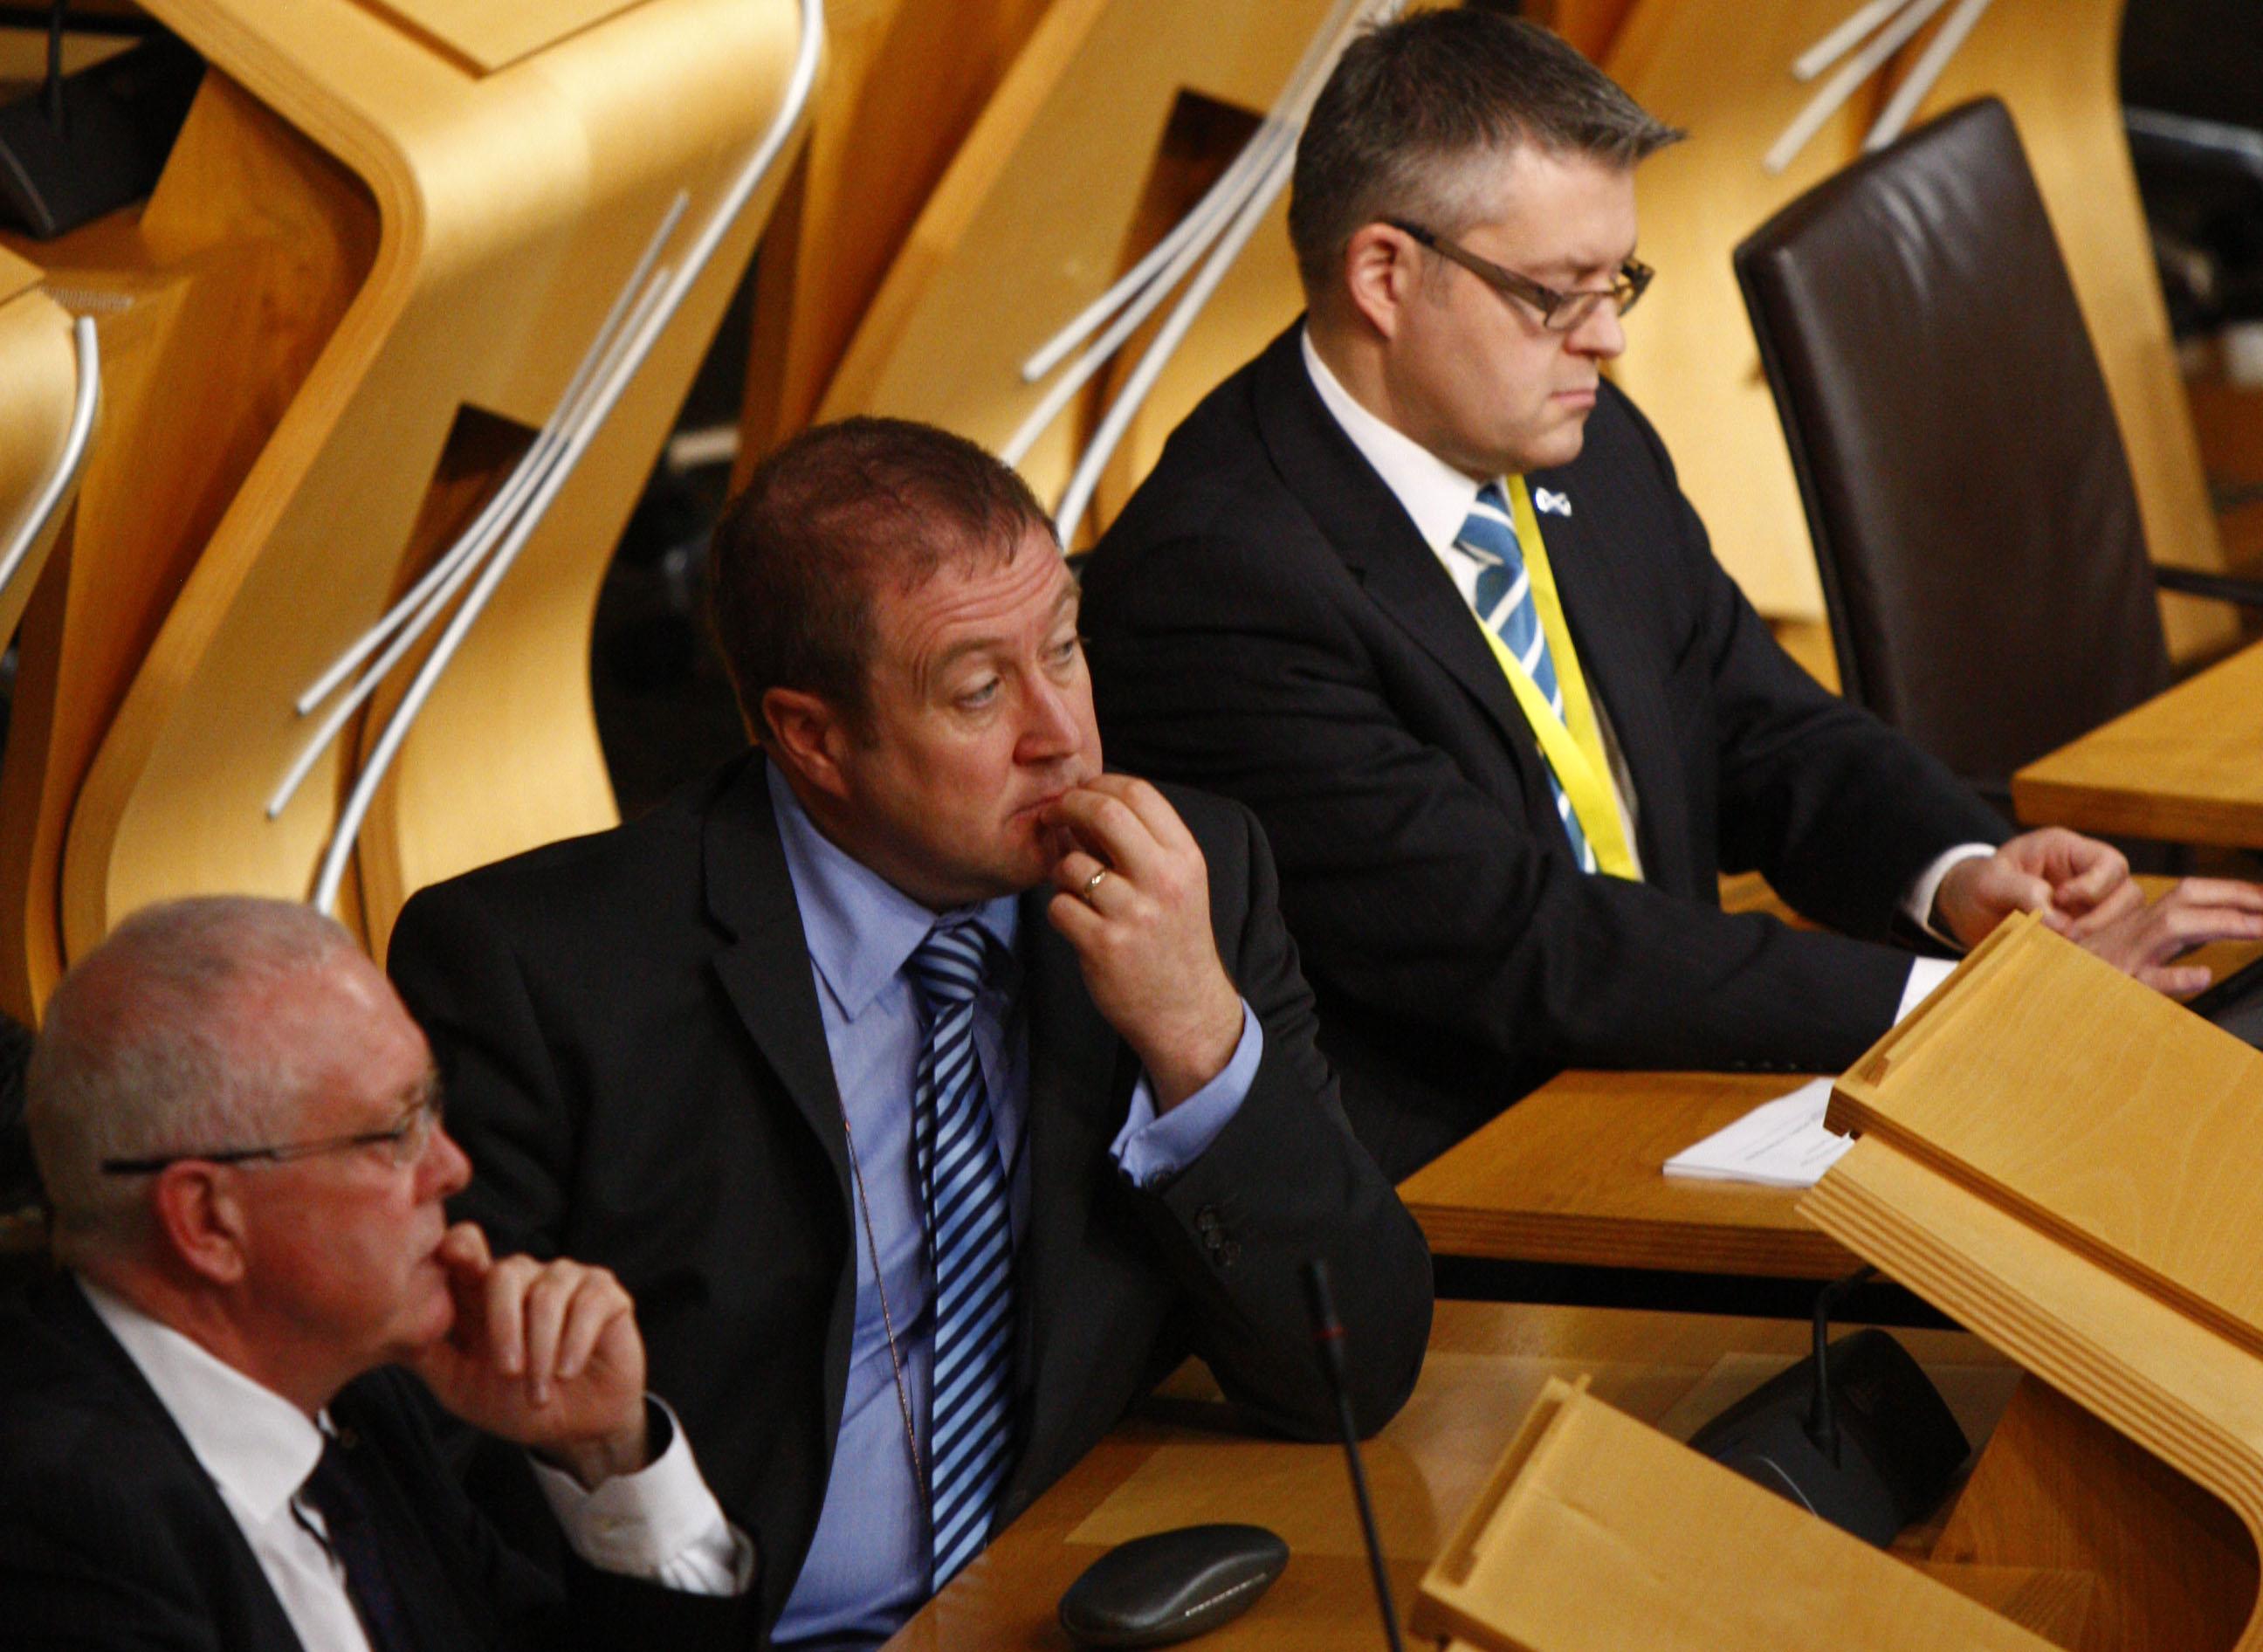 FMQ 4/12/14 Graeme Dey MSP. Pic - Maurice Laneres/Scottish Parliament